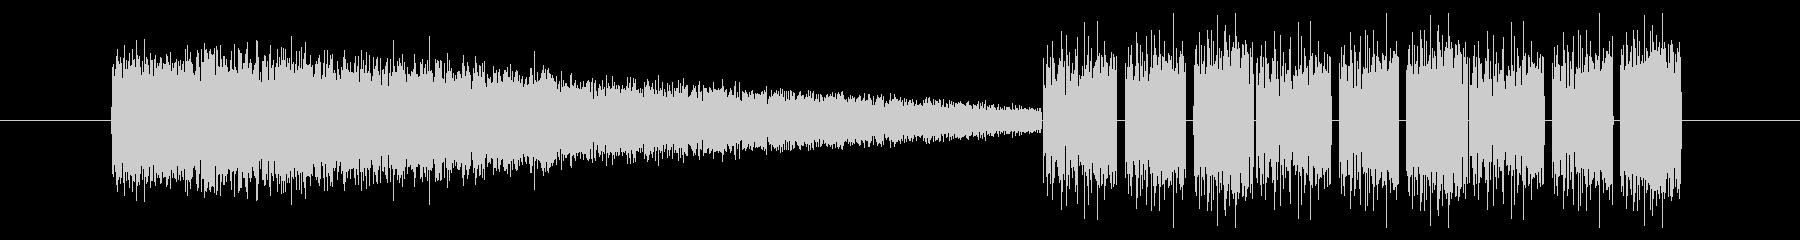 SNES-RPG04-10(魔法 氷3)の未再生の波形